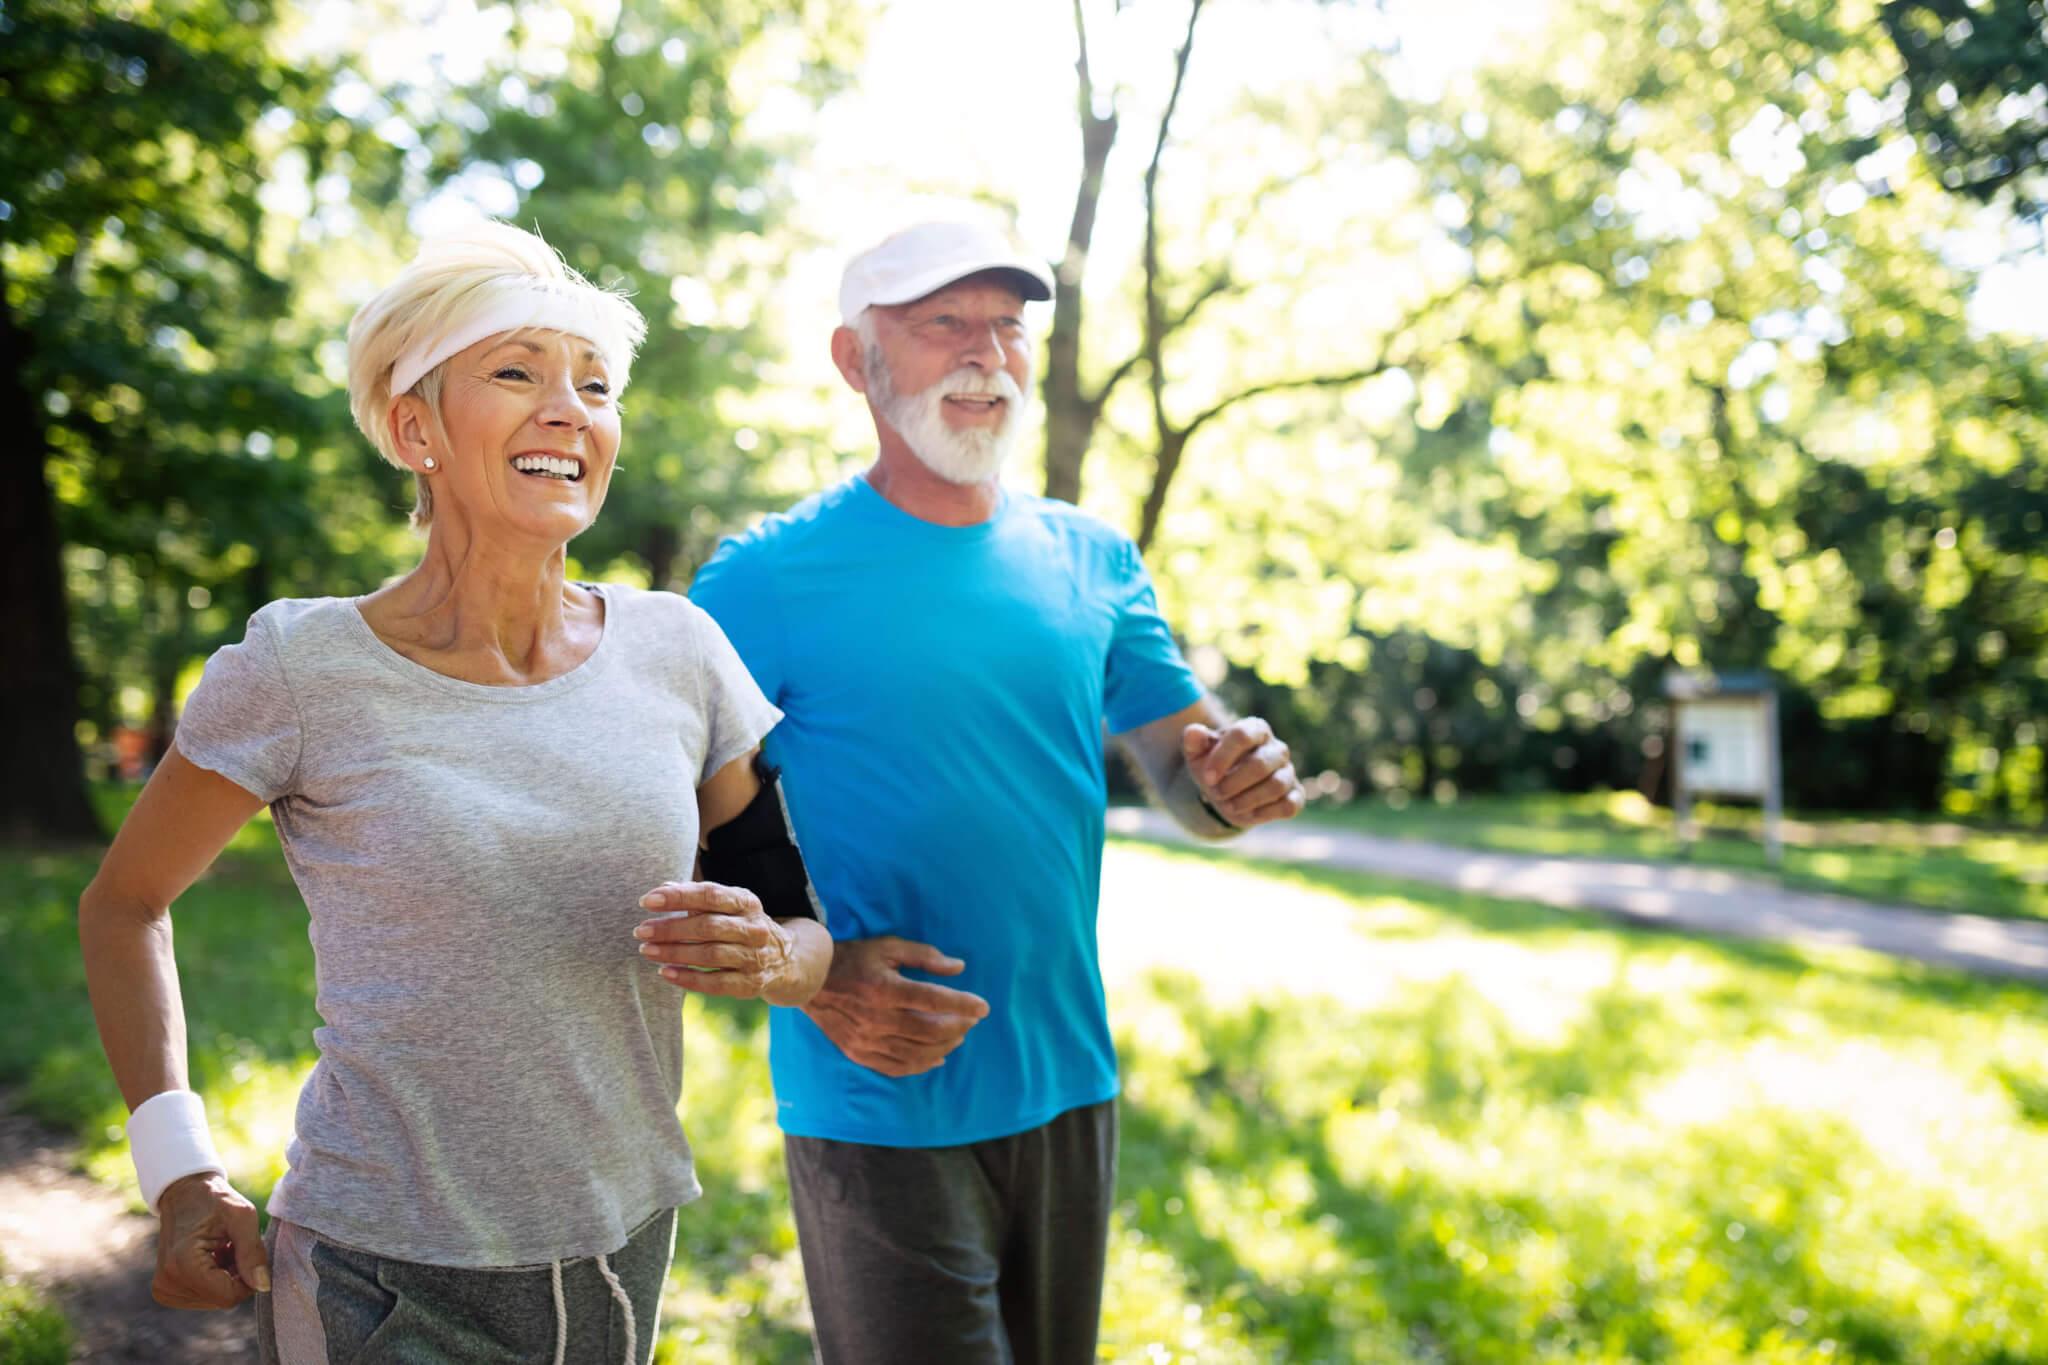 healthy living | Gundry MD